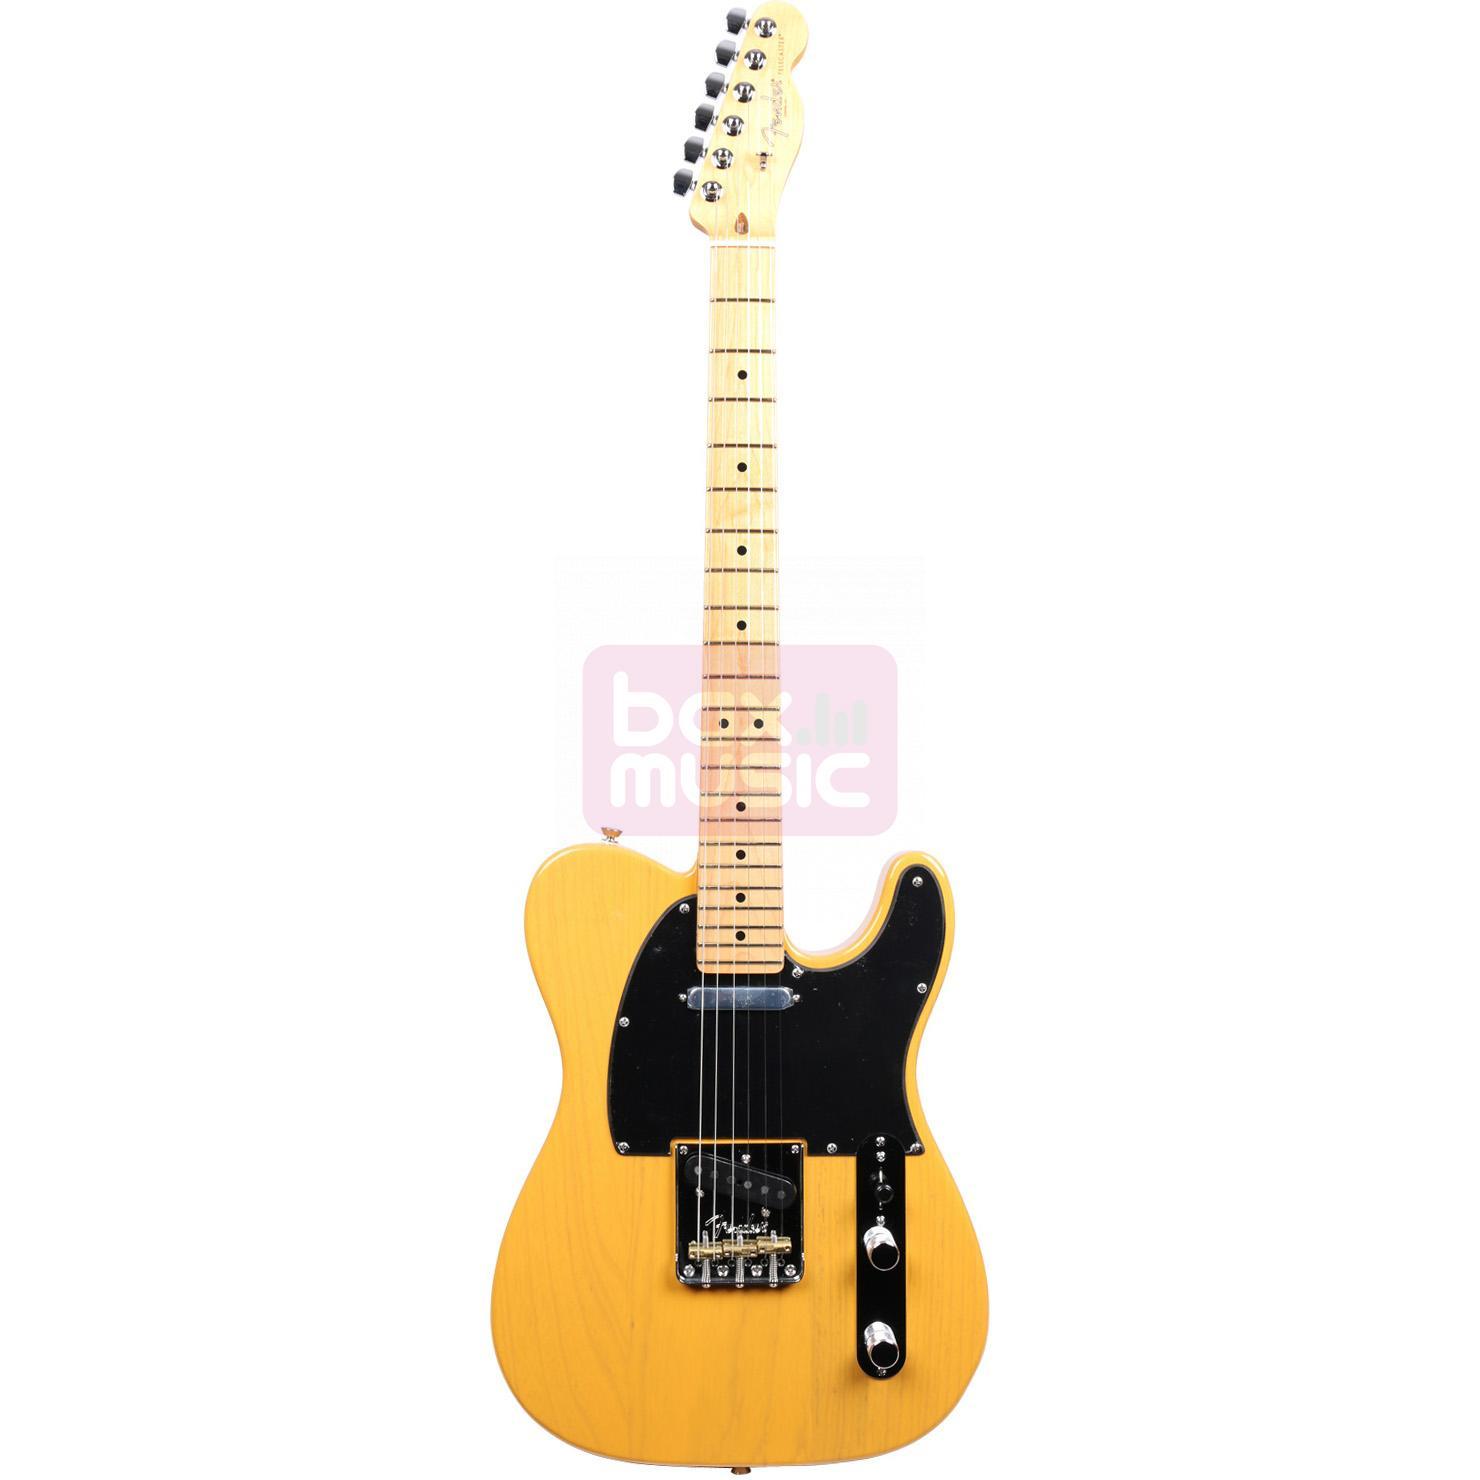 Fender American Professional Telecaster Butterscotch Blonde MN